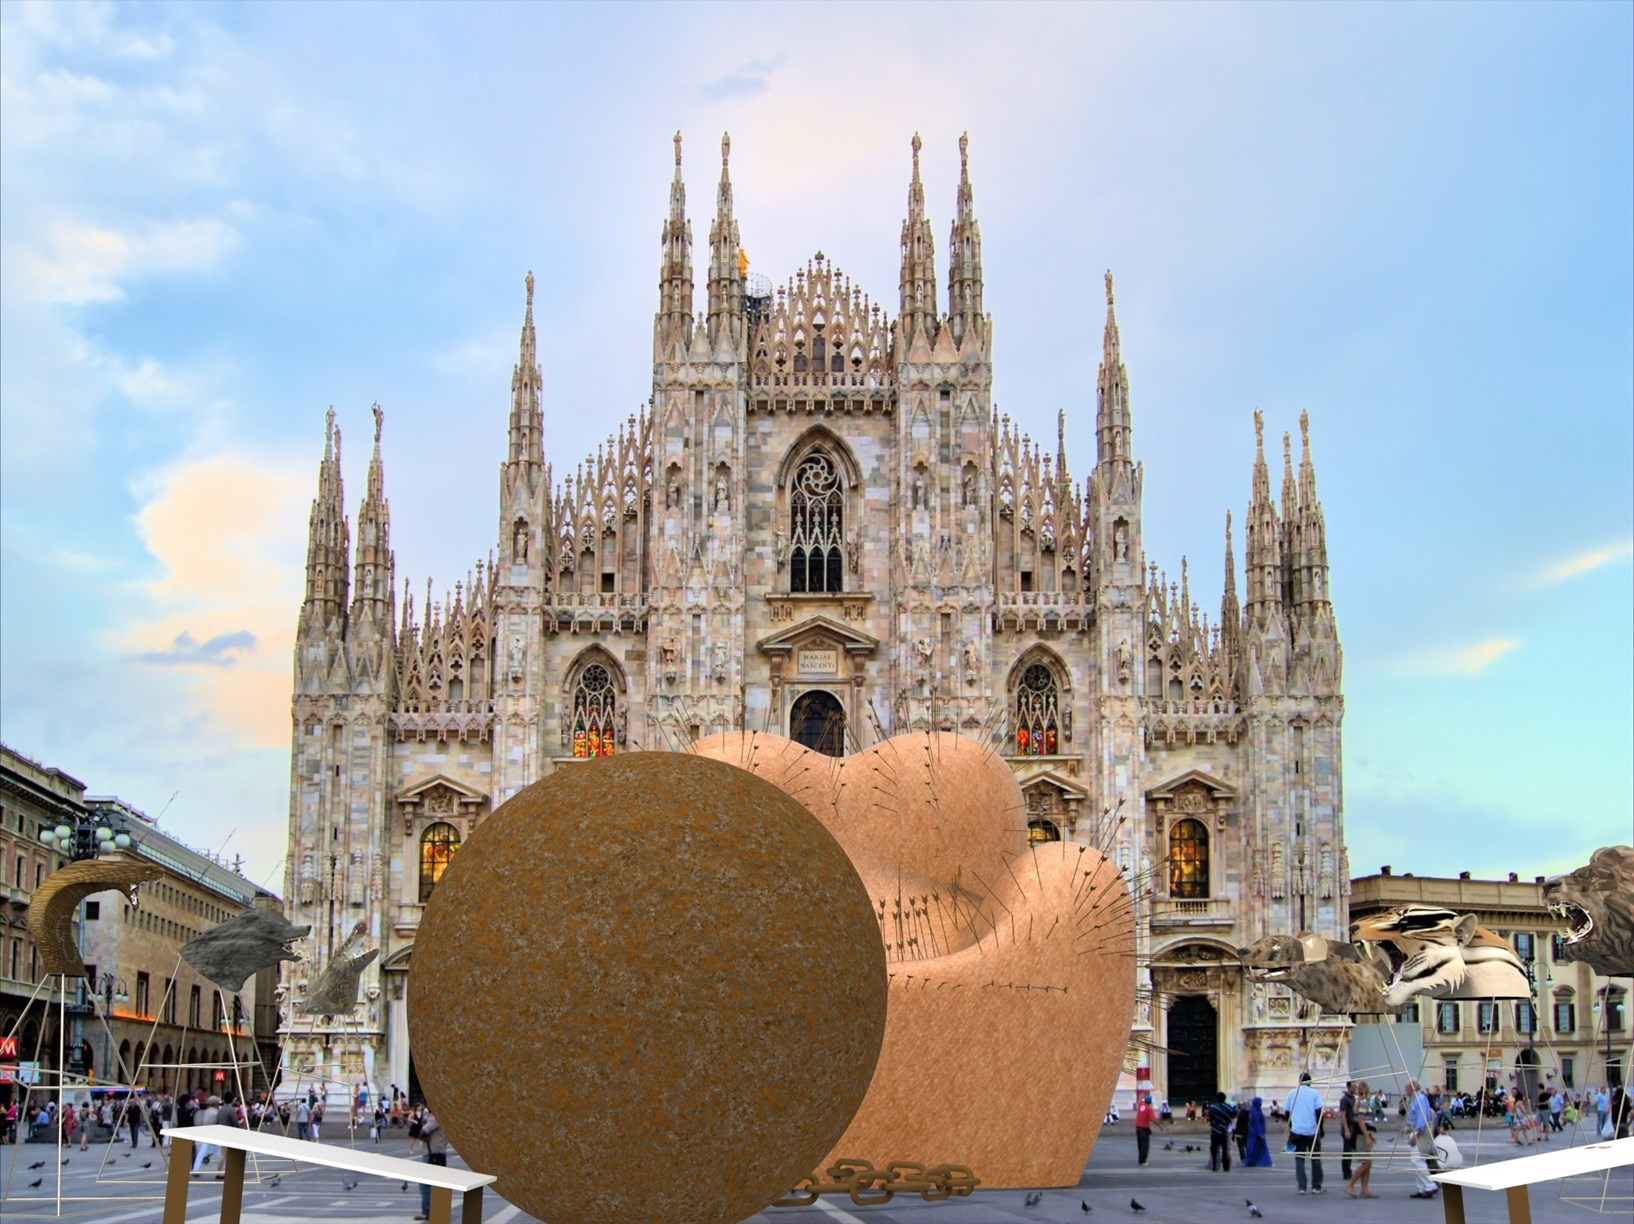 10 must-see installations at Milan Design Week: Gaetano Pesce's 'Maestà Soffrente'